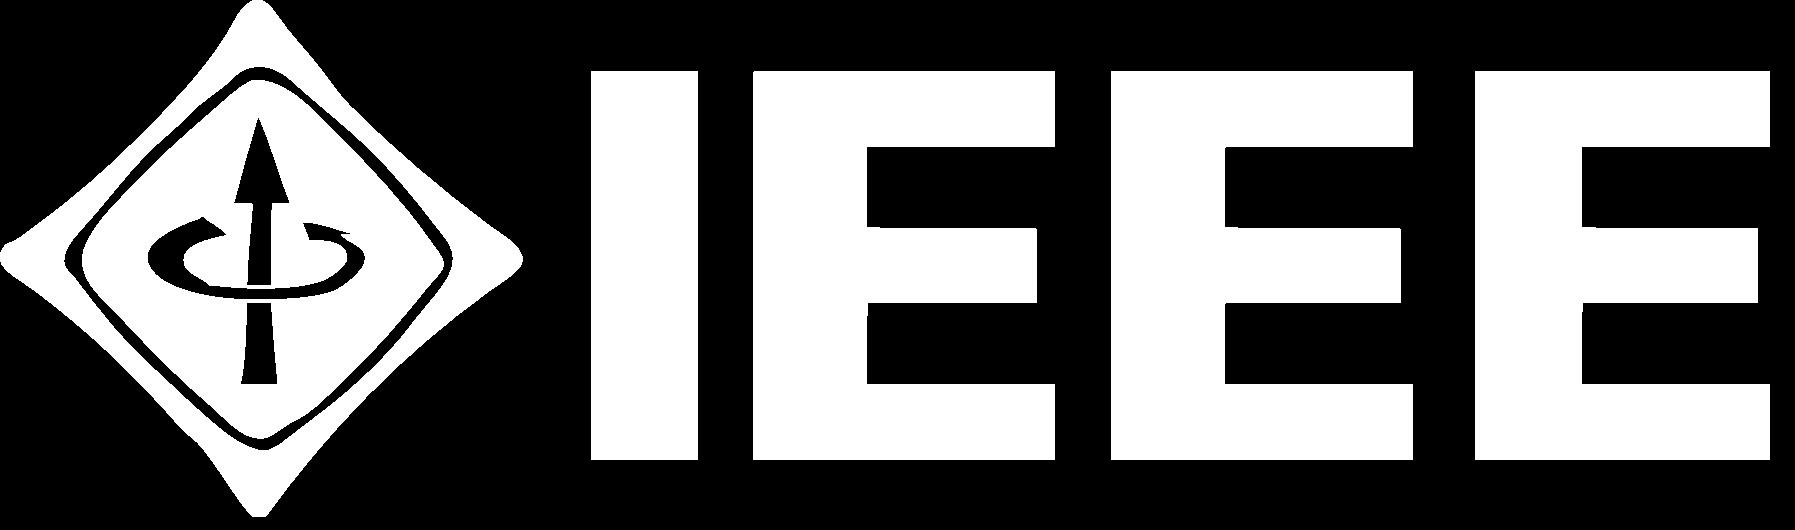 IEEE_logo_white.png